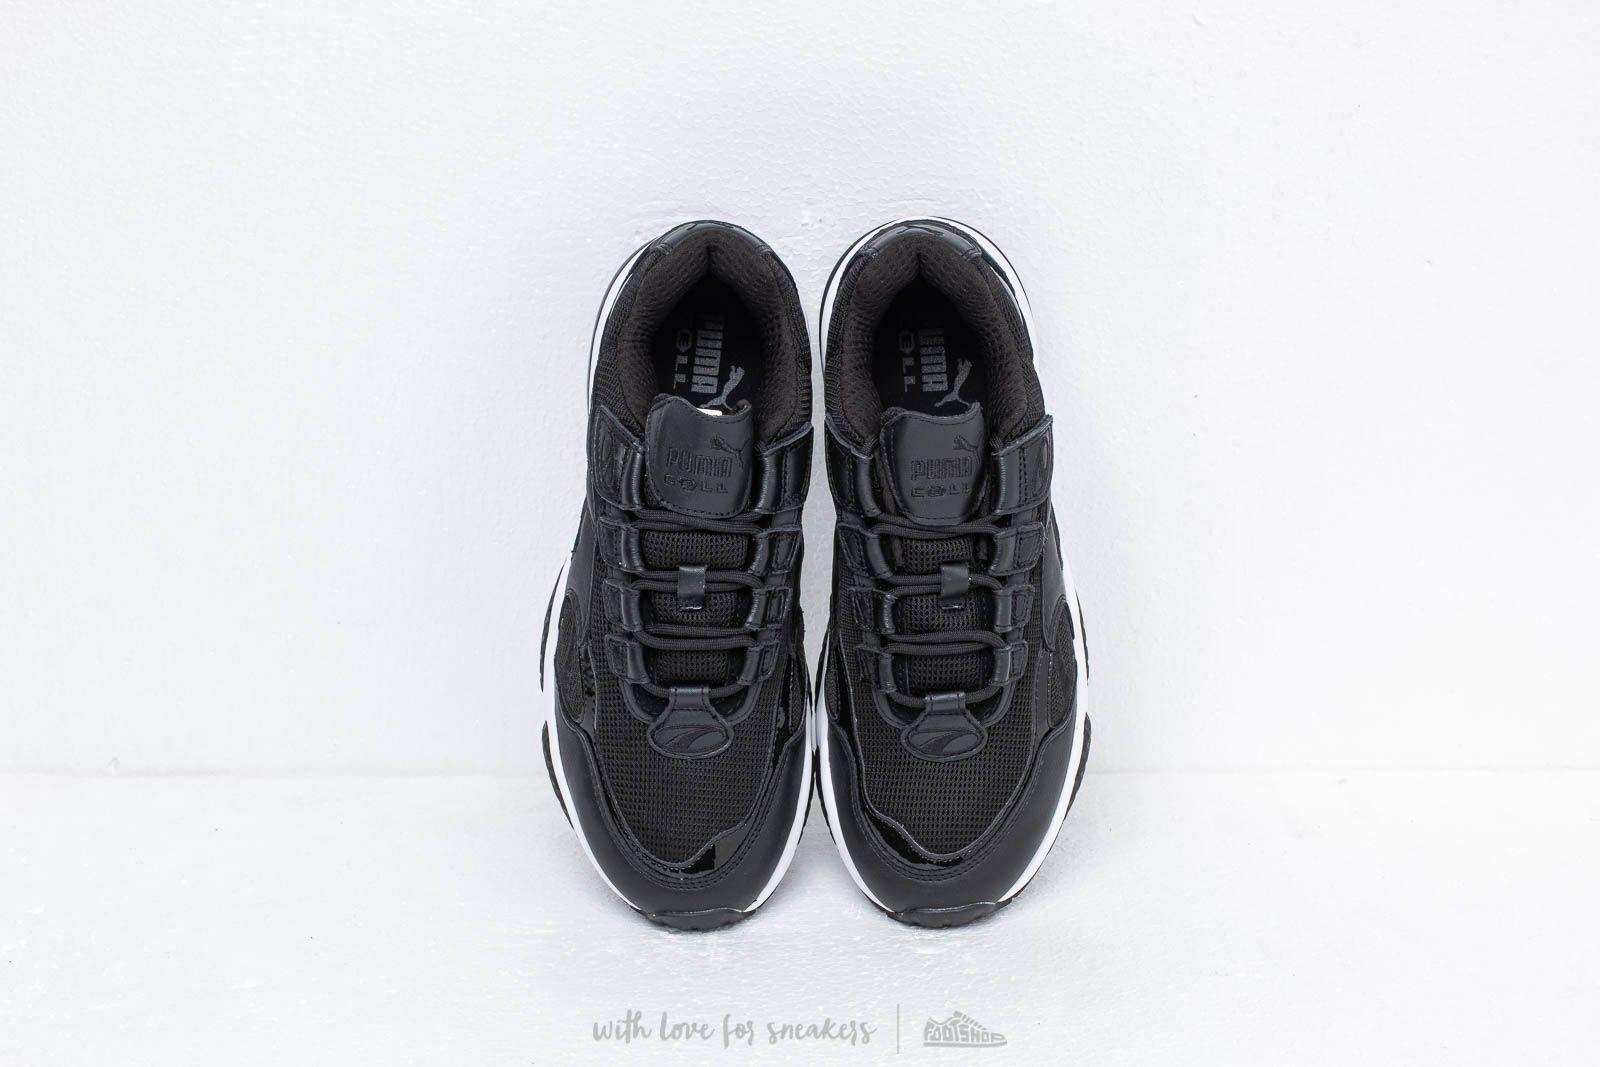 Puma Cell Venom Reflective Puma Black  Puma White za skvělou cenu 3 090 Kč  koupíte 4676143570